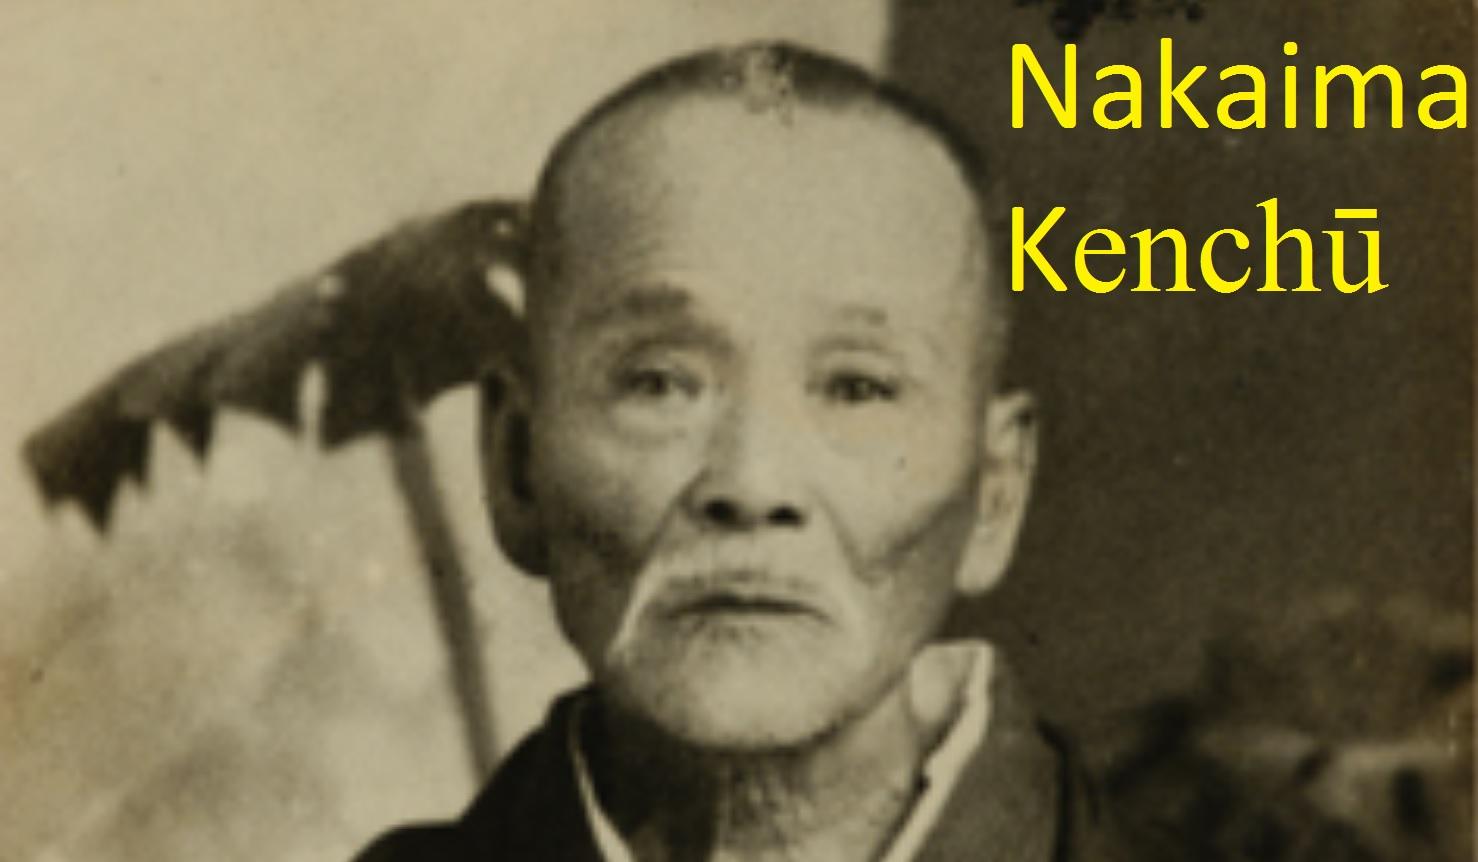 Nakaima Kenchu (1856-1953)